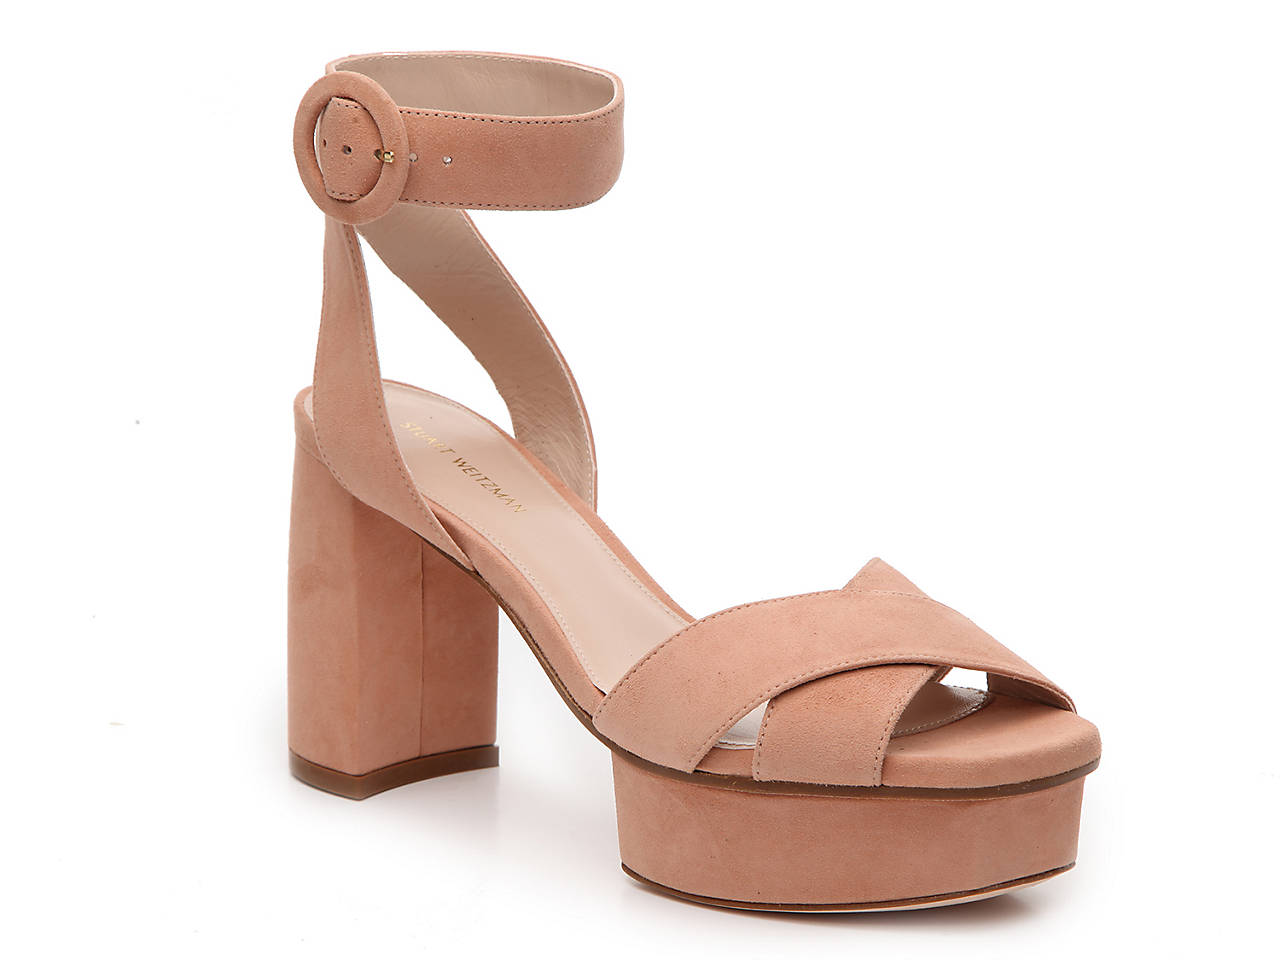 cc8339b4471f Stuart Weitzman - Luxury Carmina Platform Sandal Women s Shoes